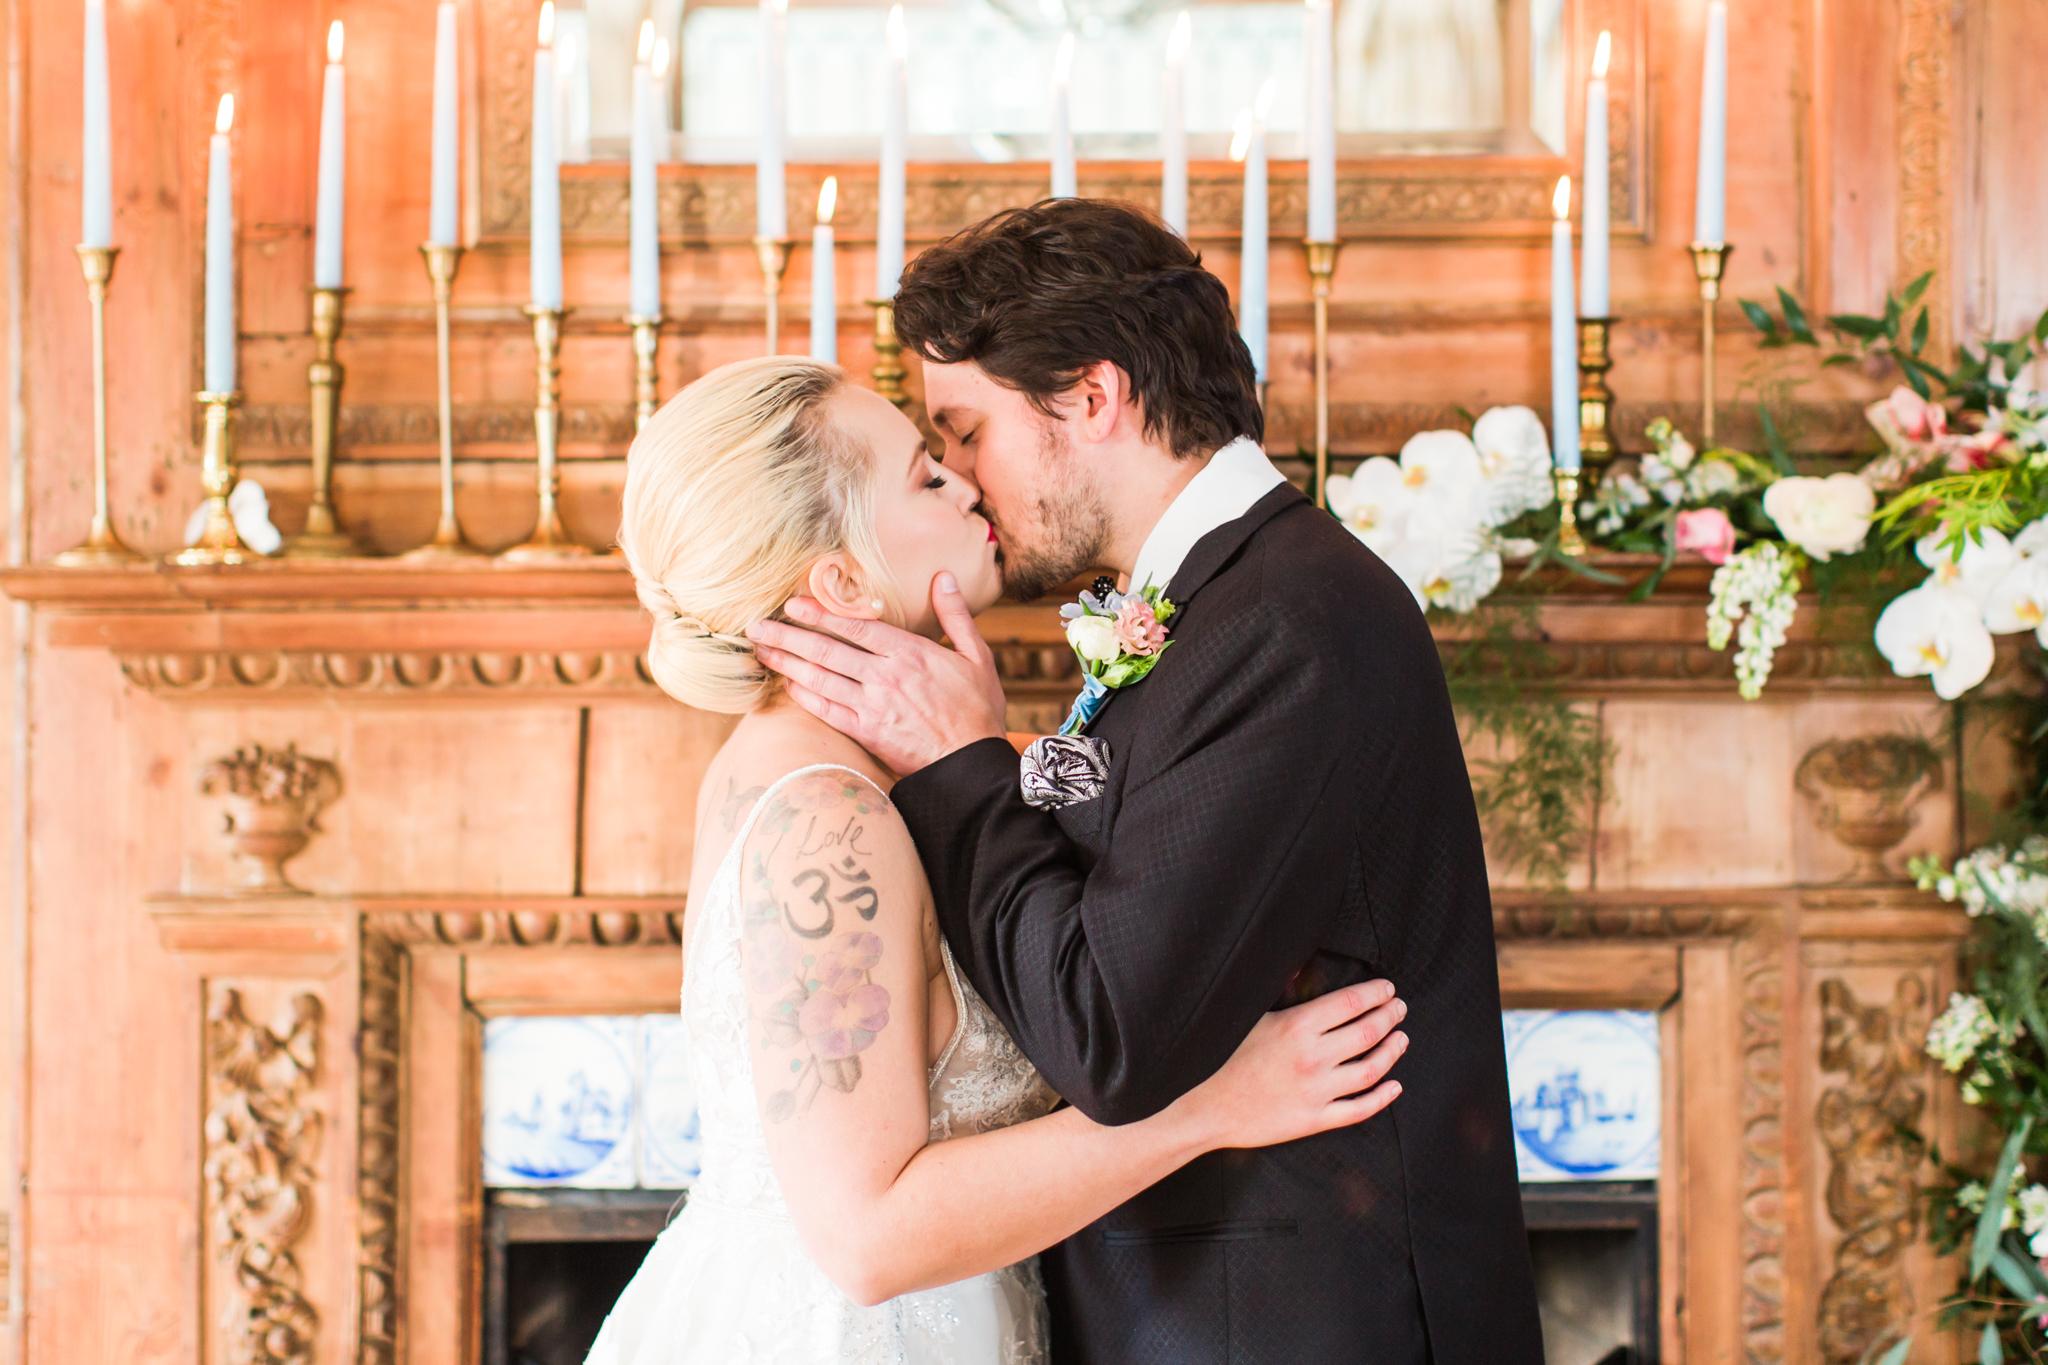 Haley Mansion Winter Wedding - Shaina Lee Photography-207.jpg